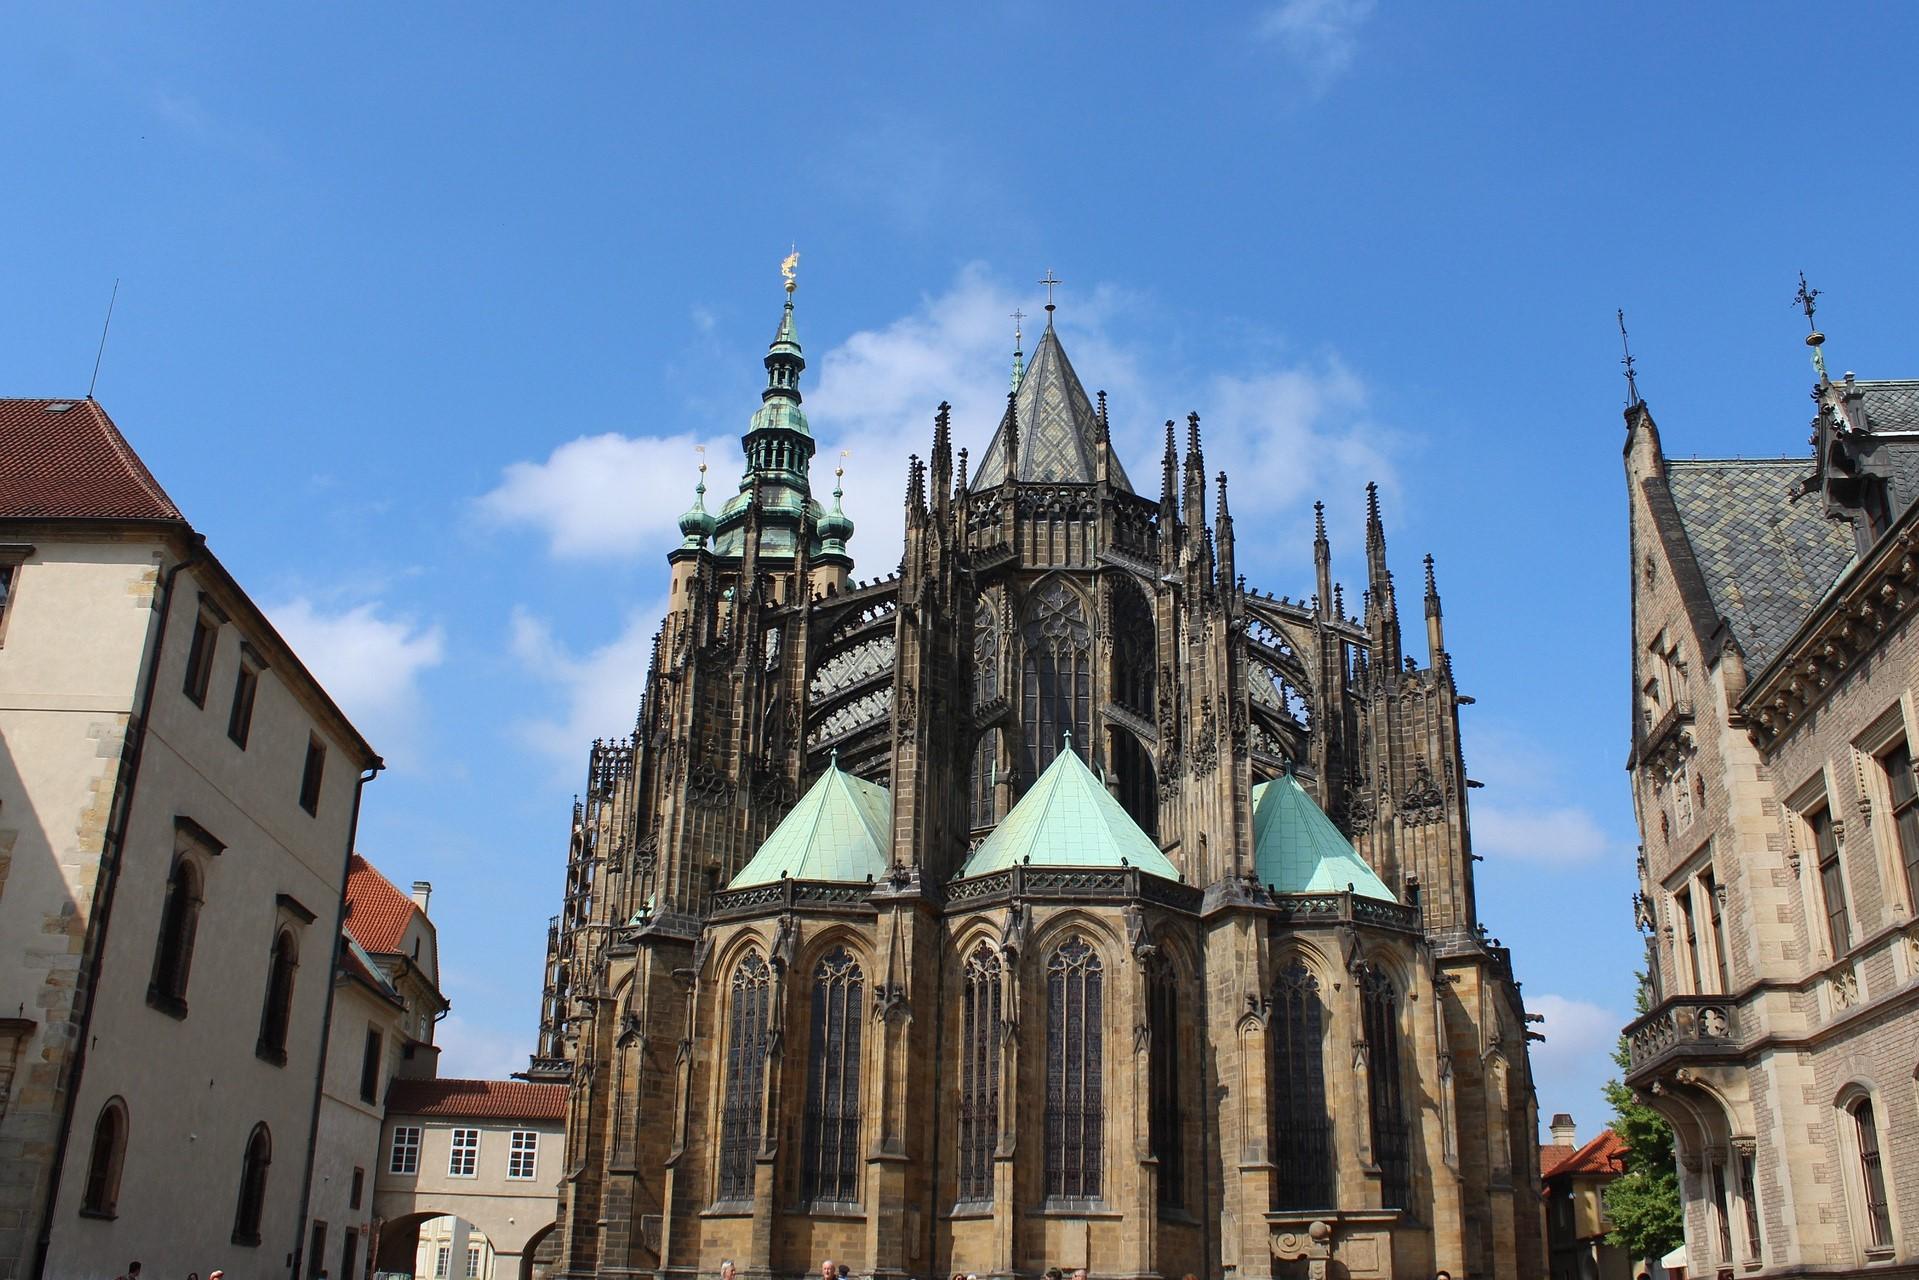 The impressive St. Vitus Cathedral at Prague Castle